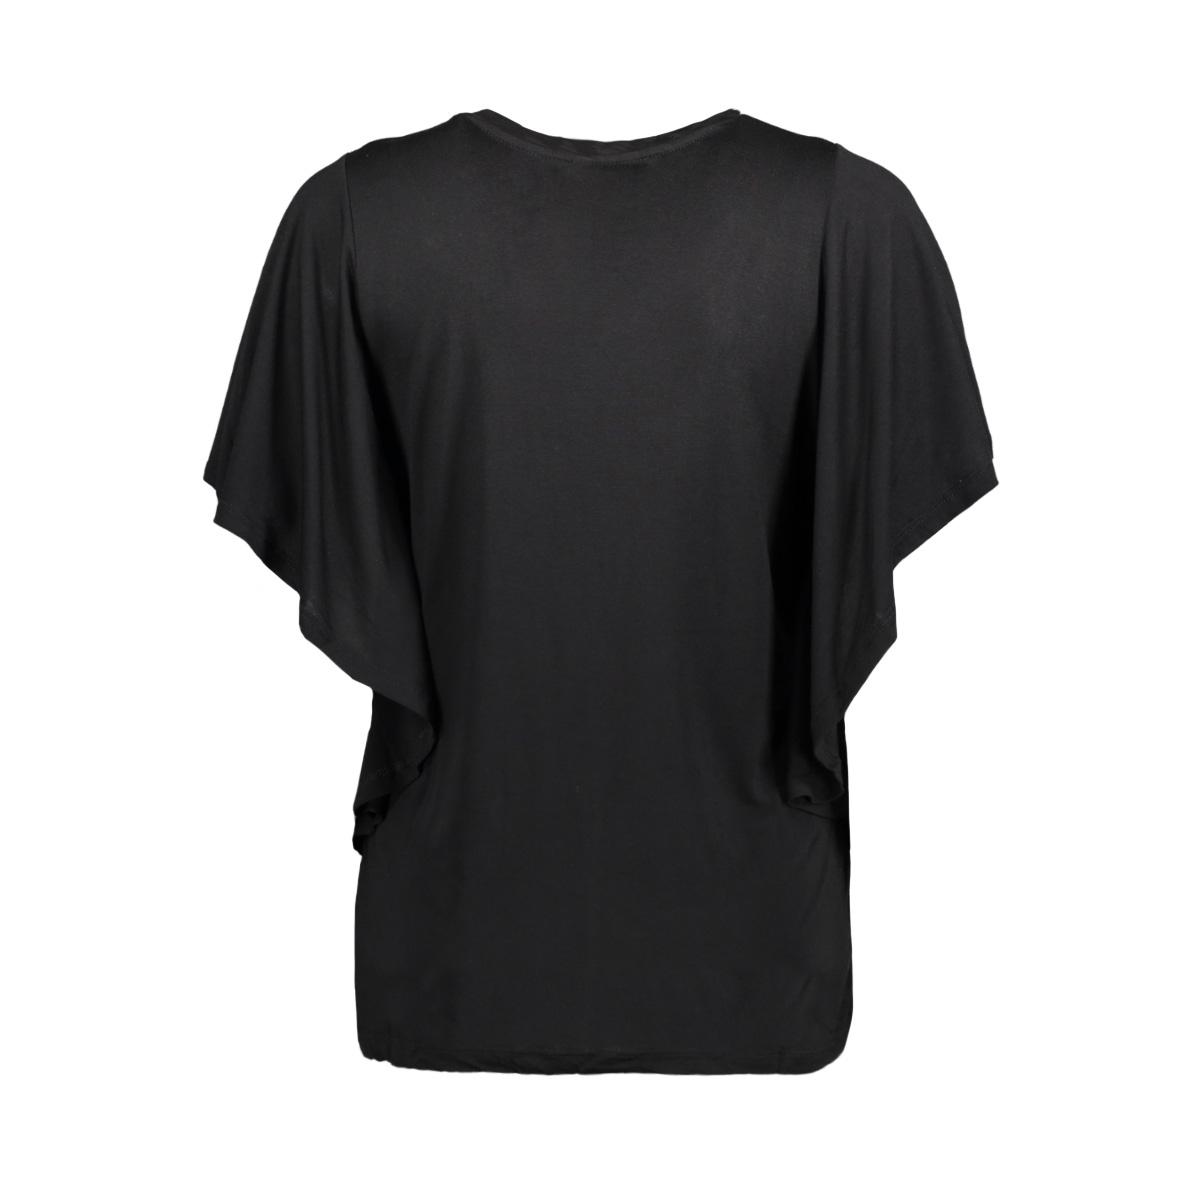 vmirfi s/s top sb8 10193608 vero moda t-shirt black